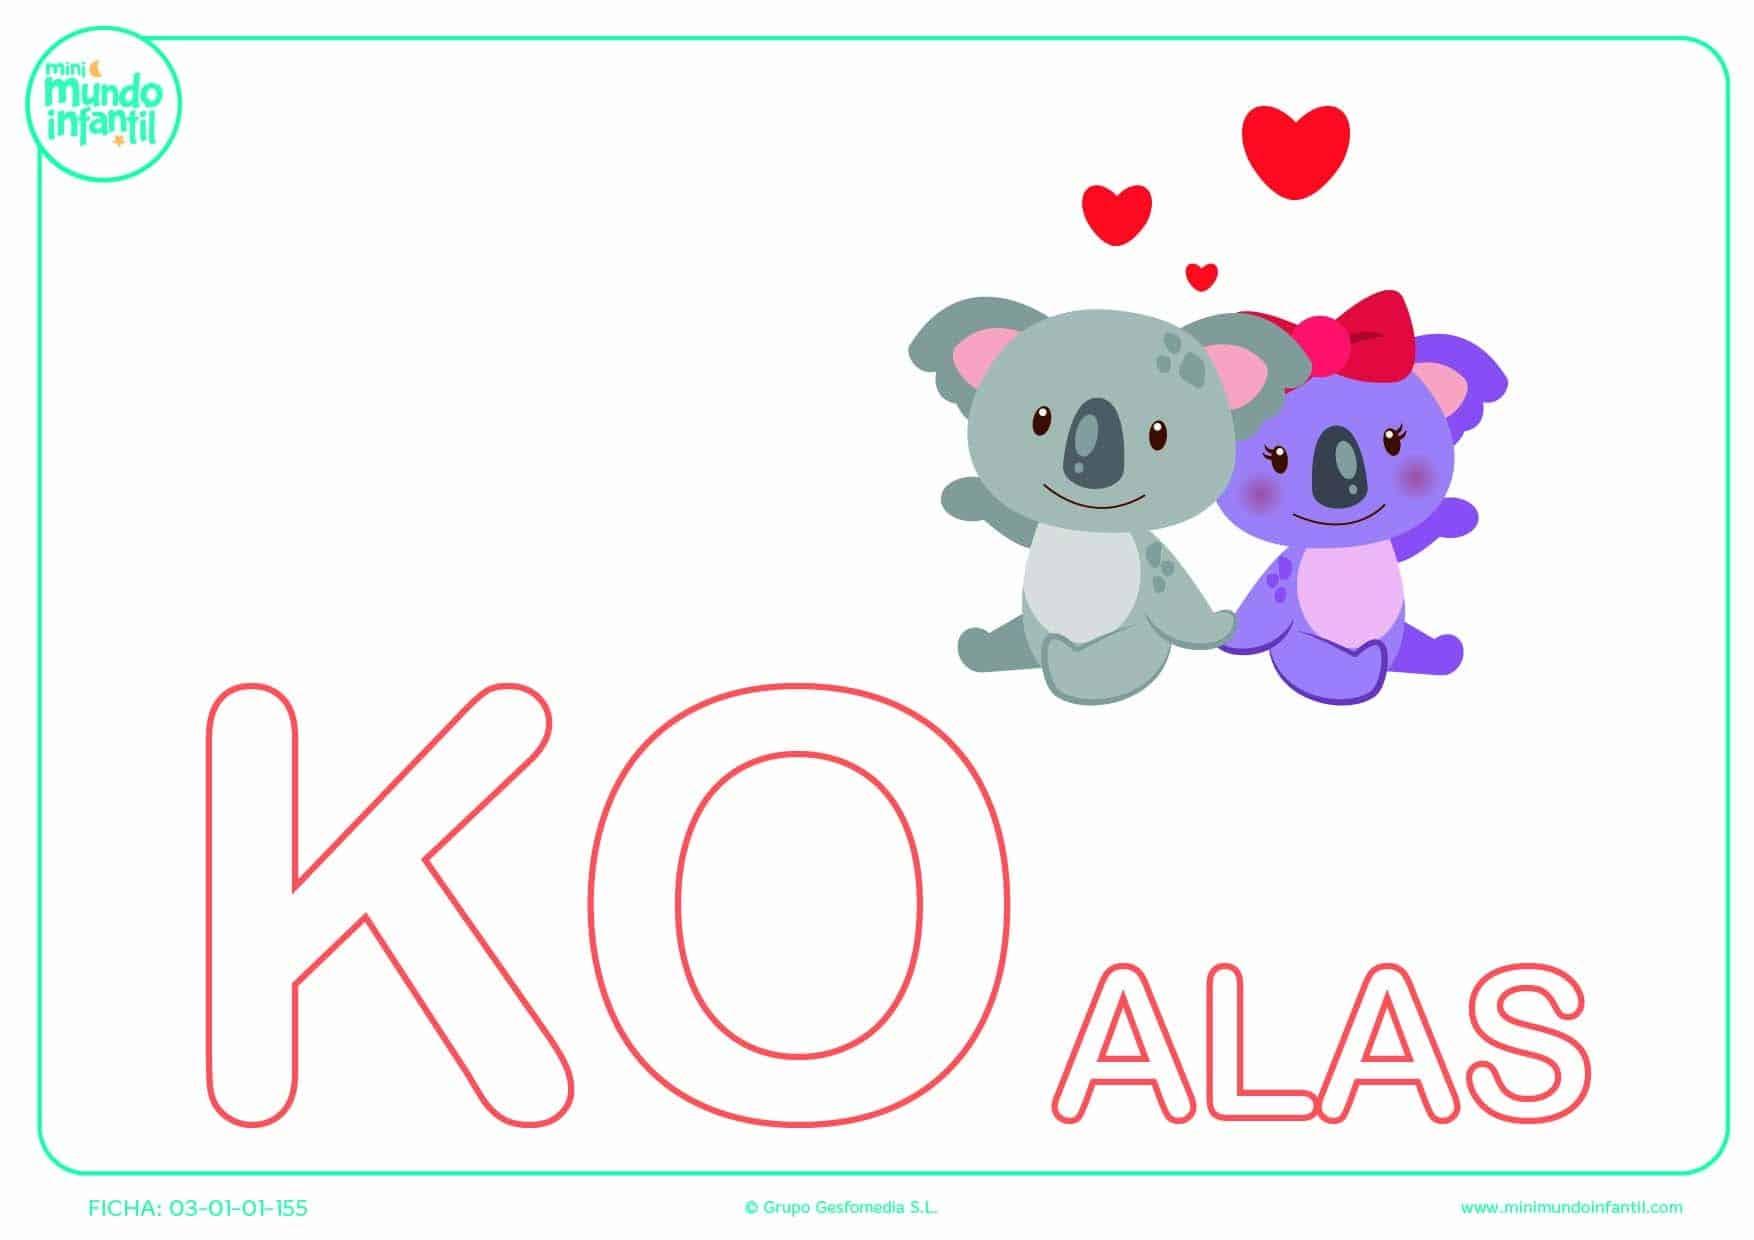 Sílaba KO de koalas en mayúsculas para completar